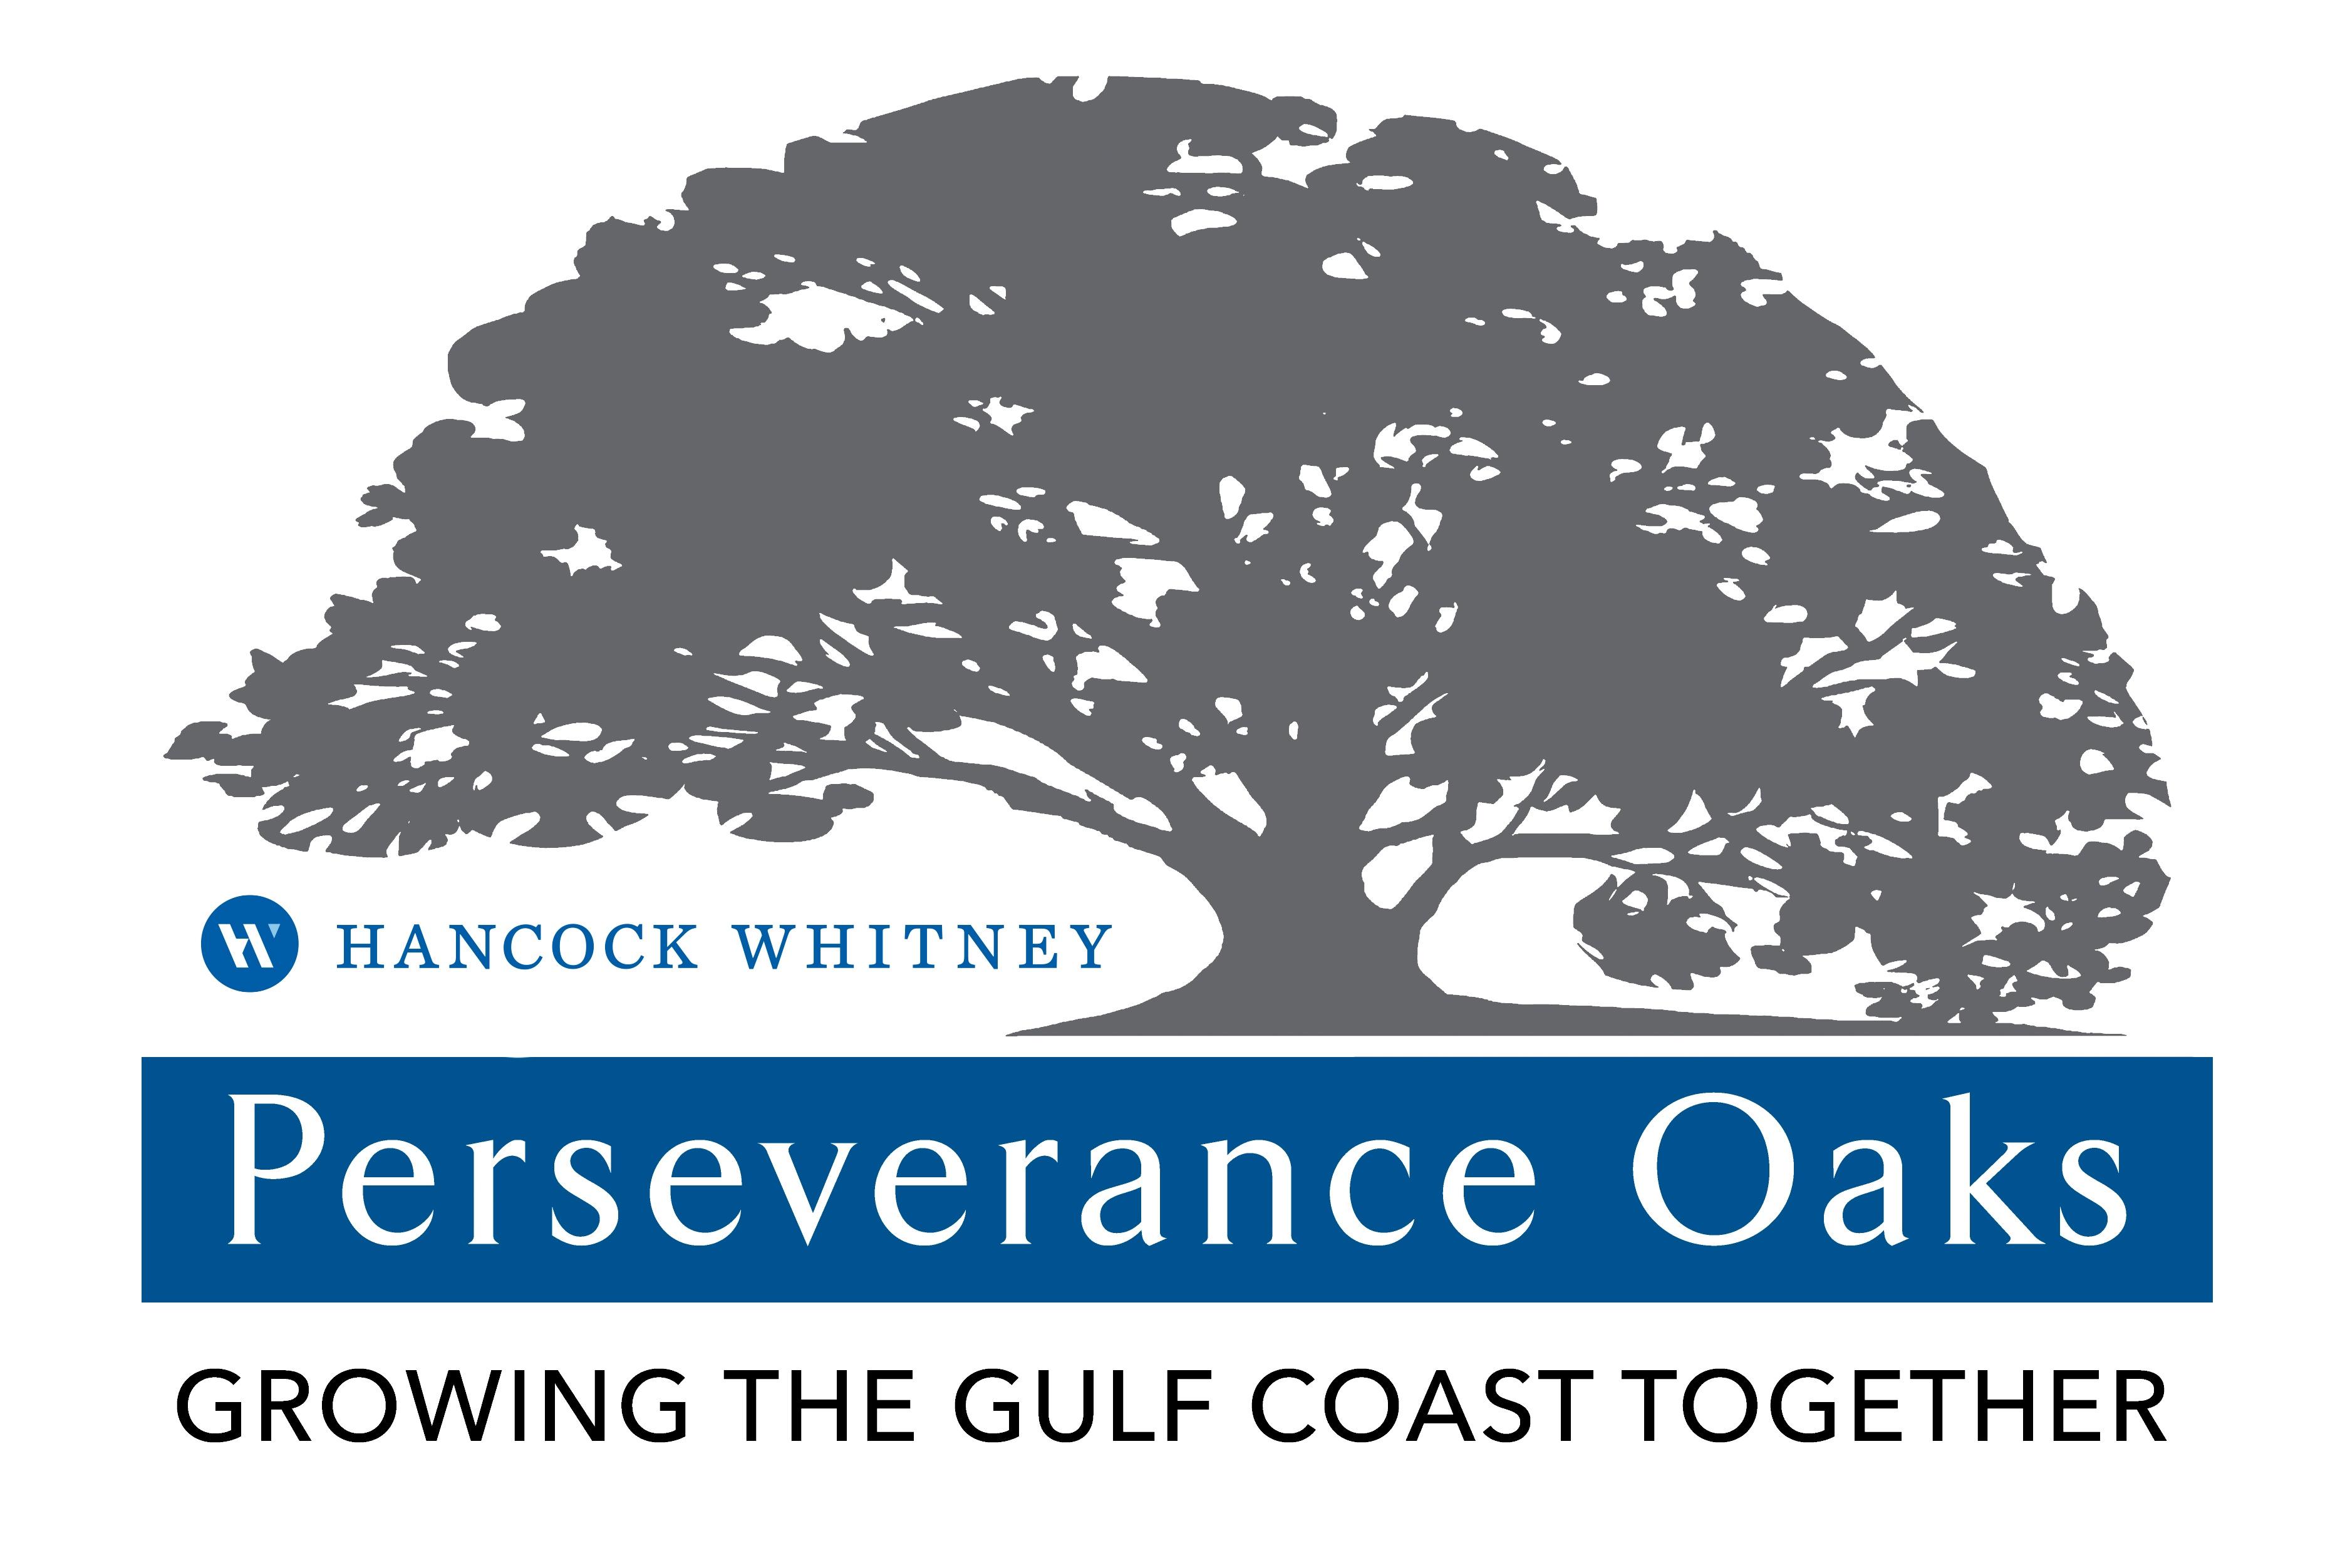 Perseverance Oaks